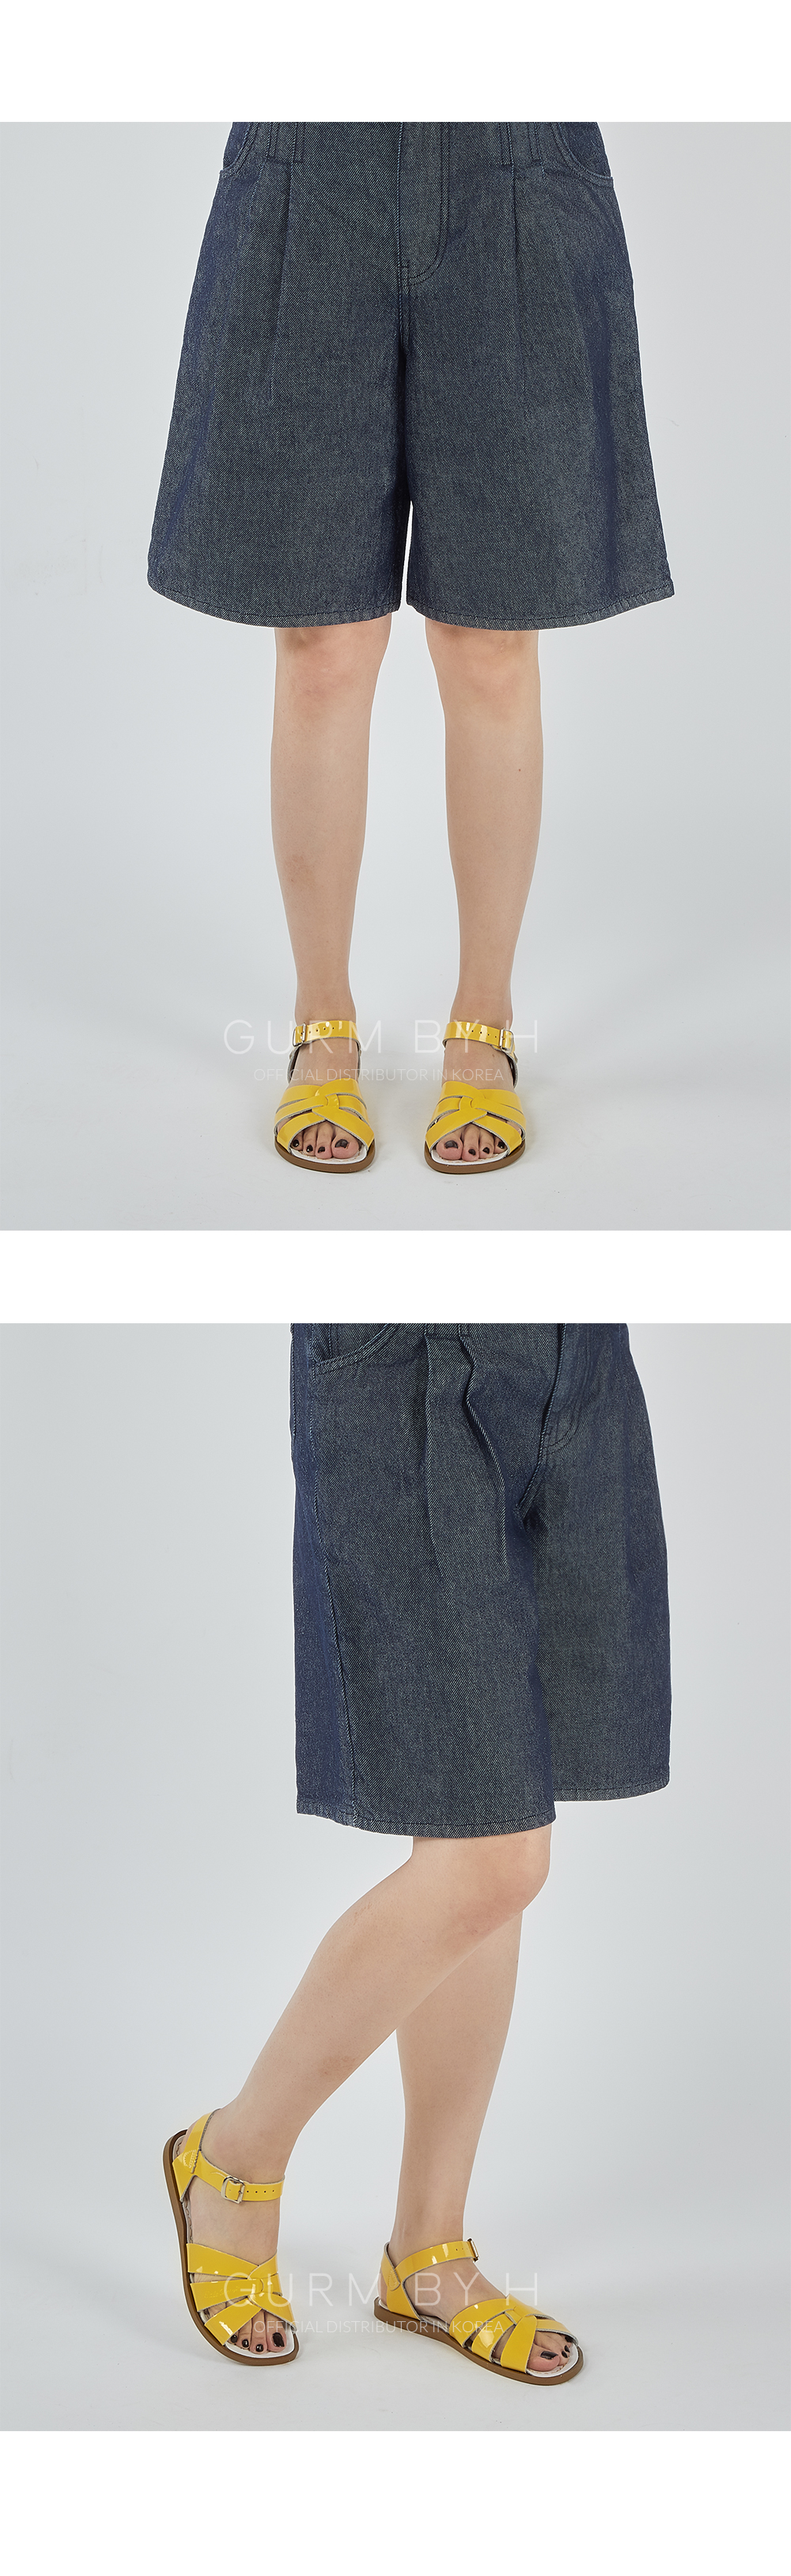 original-model-샤이니옐로우